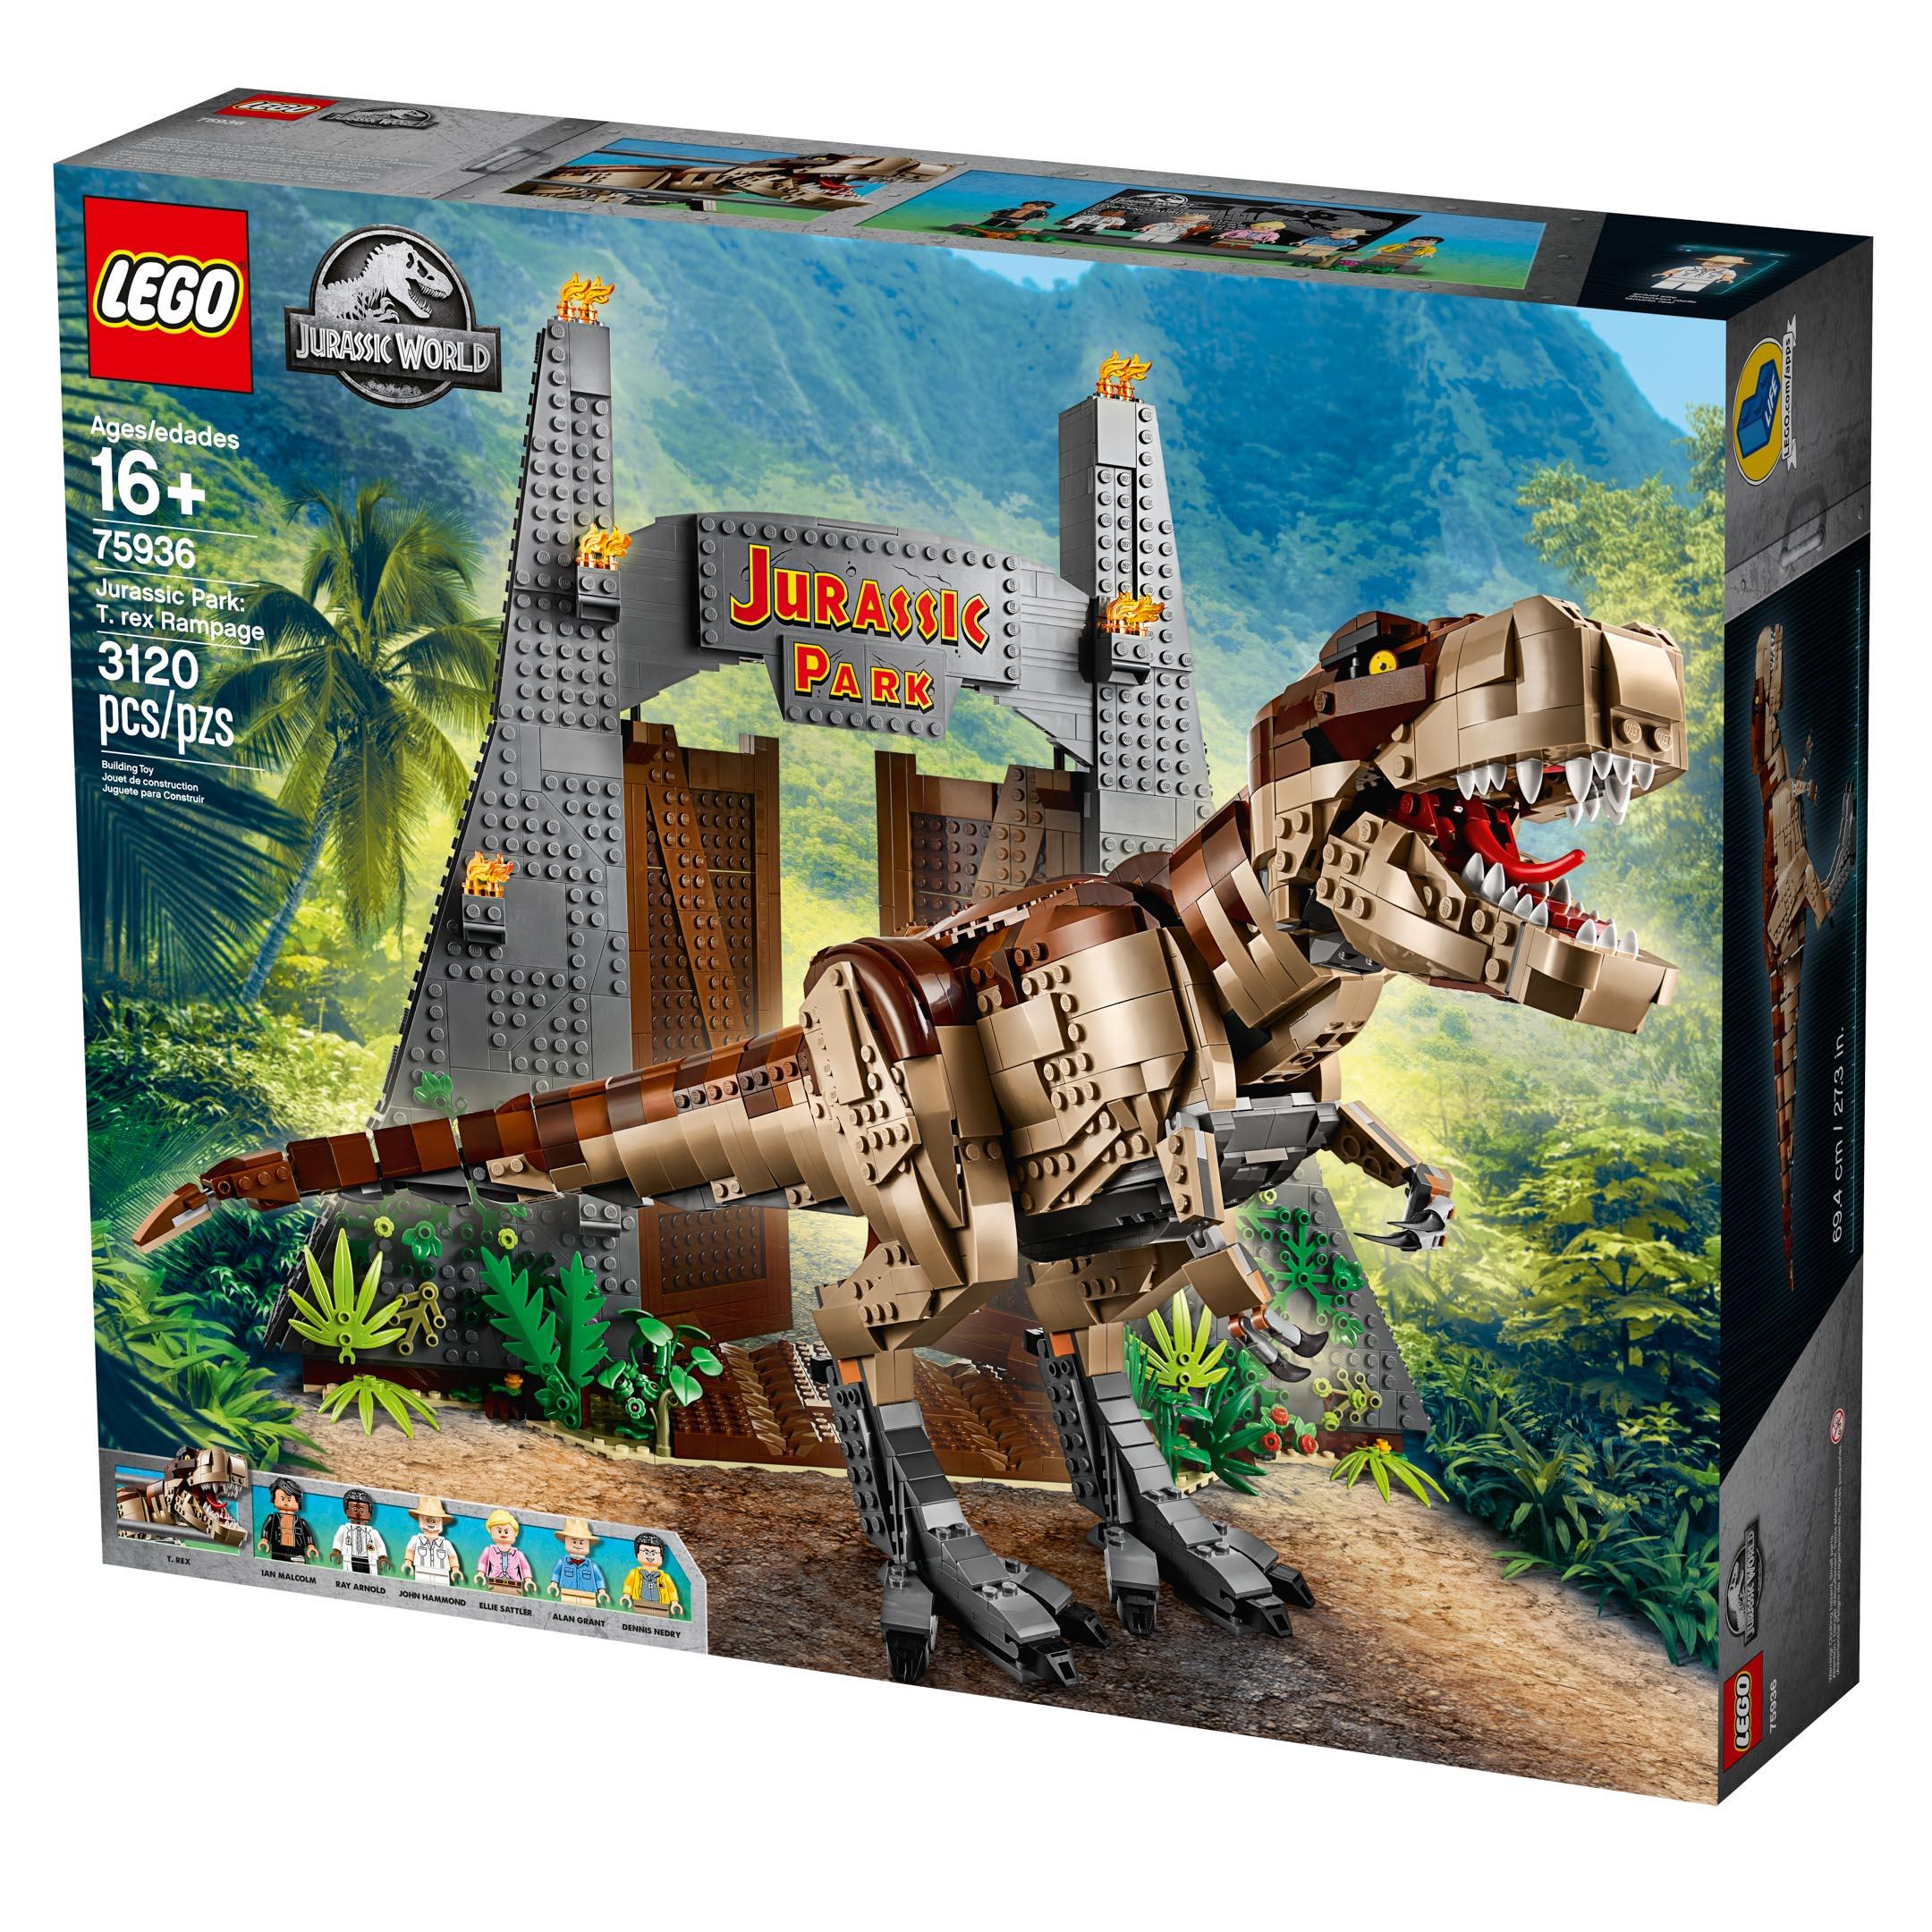 Nuovo set Lego Jurassic Park: La furia del T-Rex thumbnail